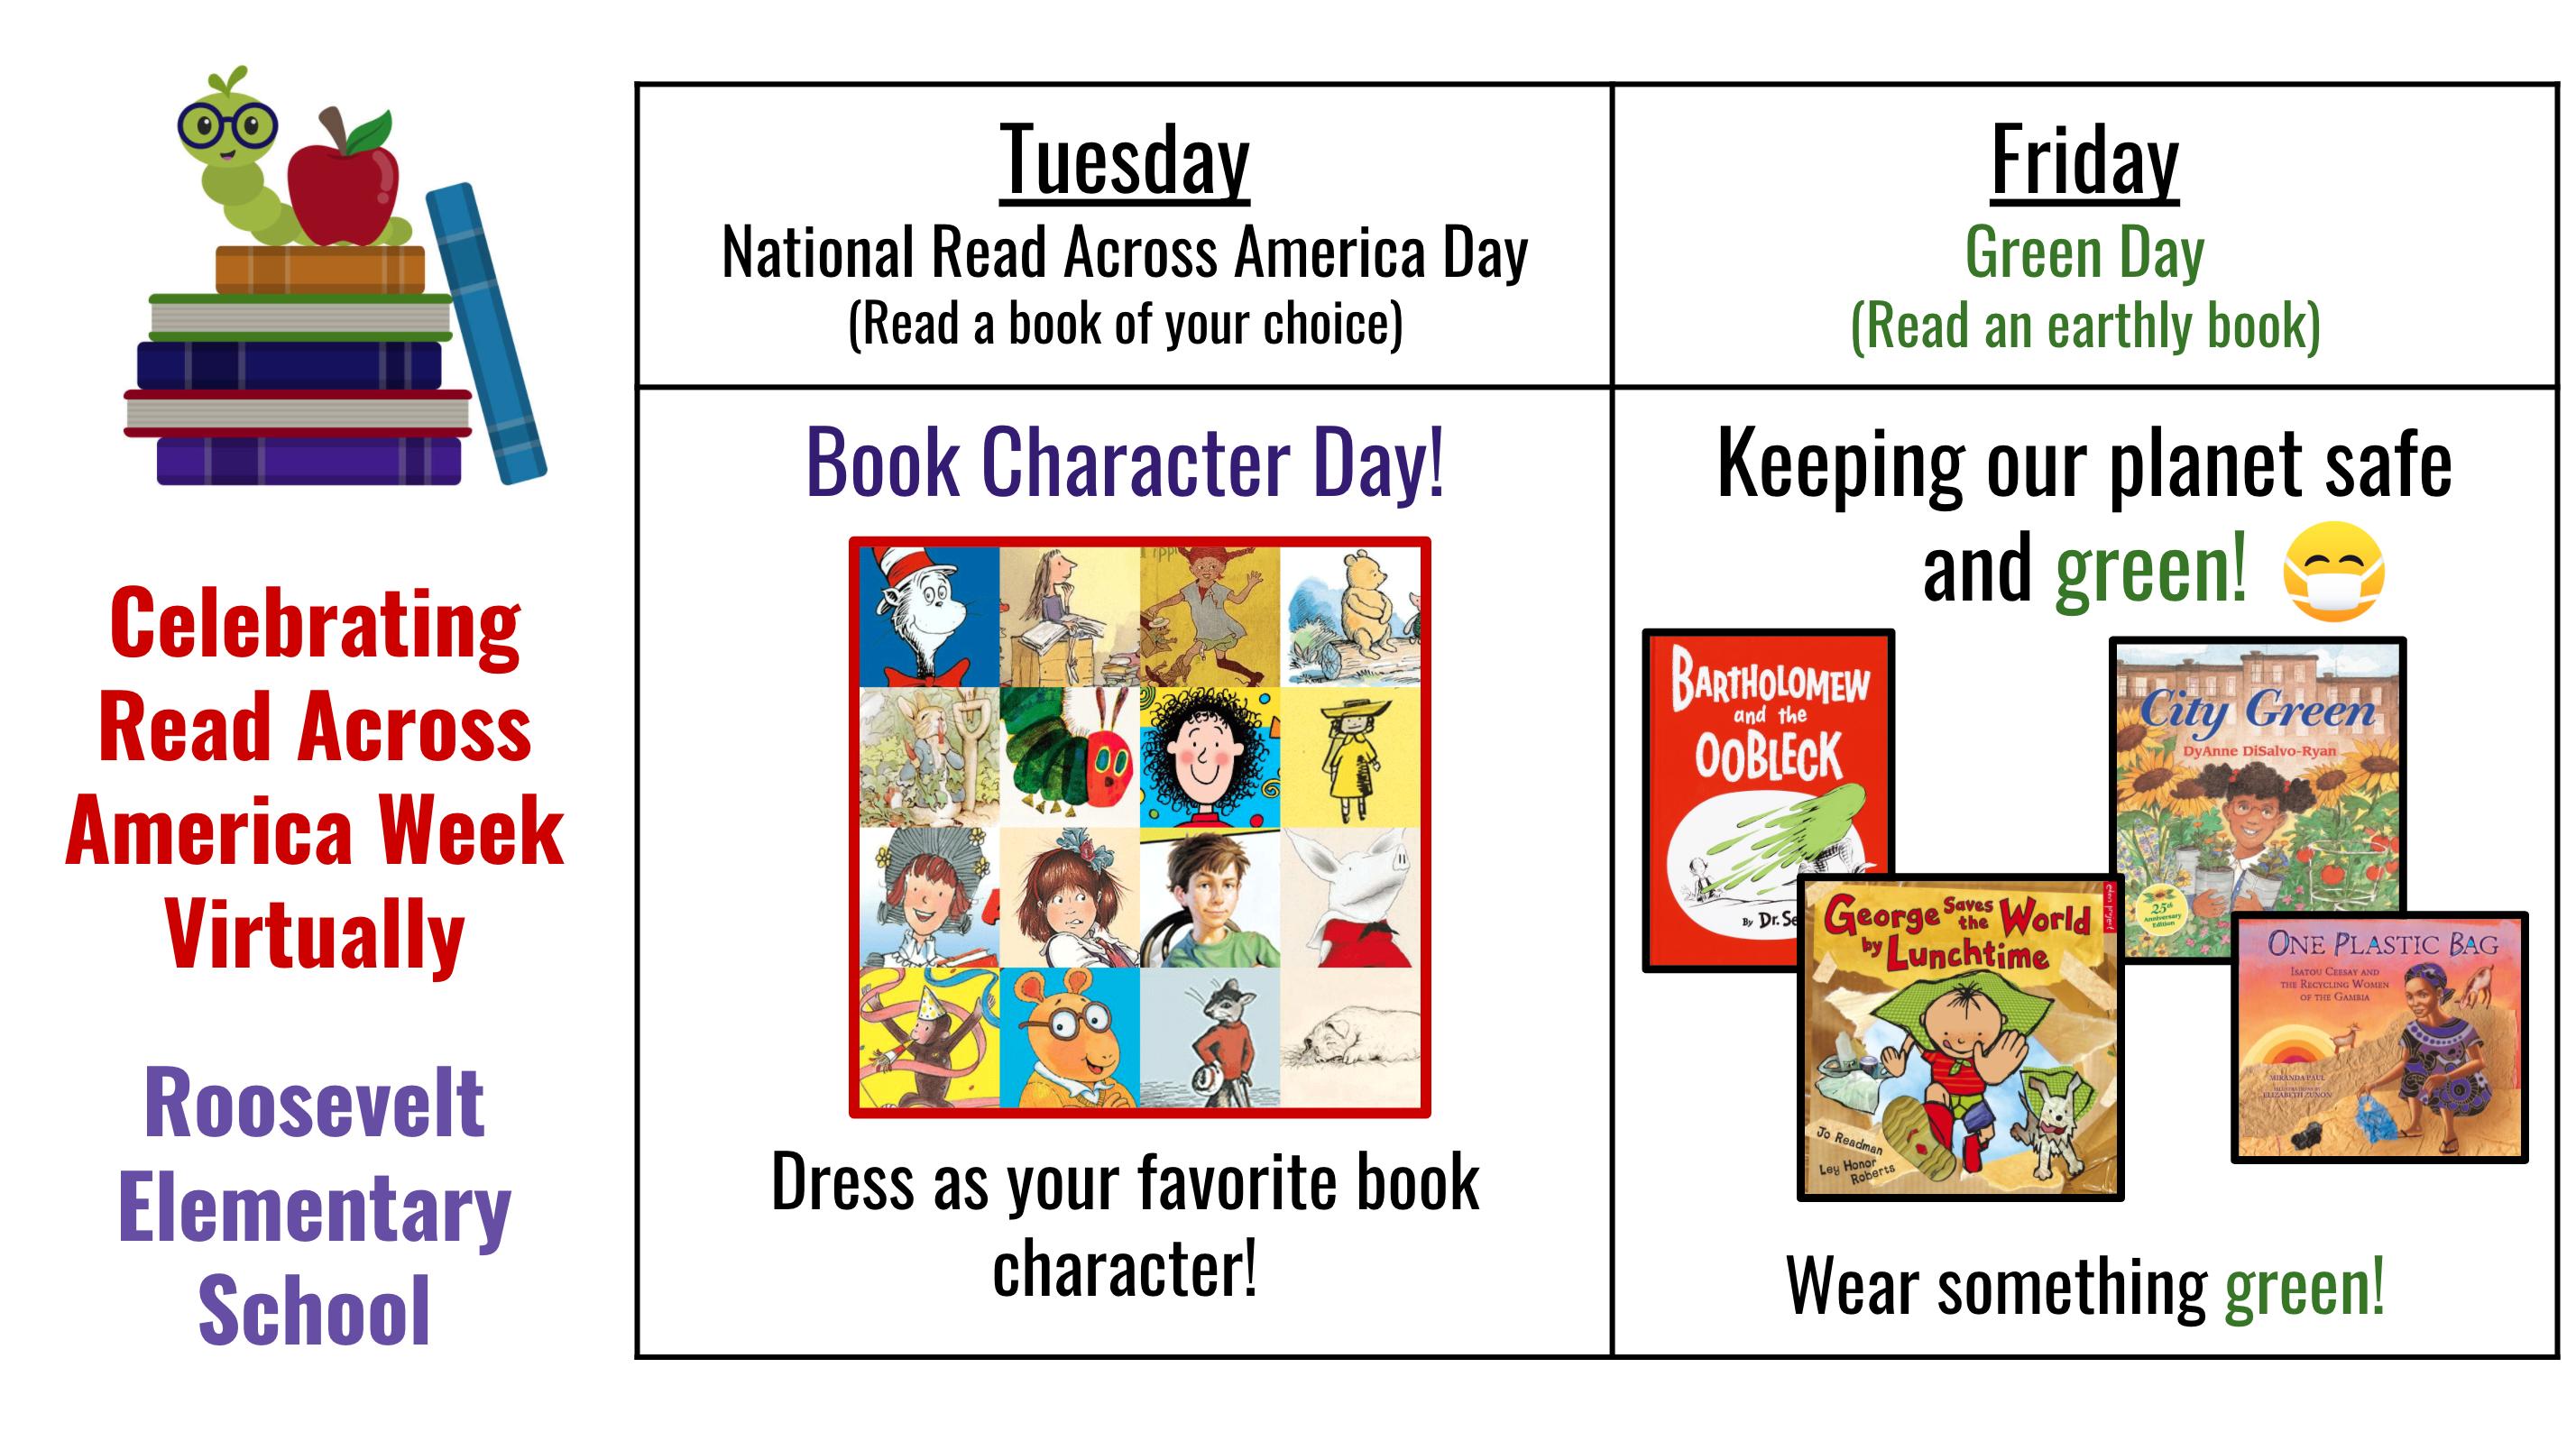 Roosevelt School's Read Across America Week Virtual Activities